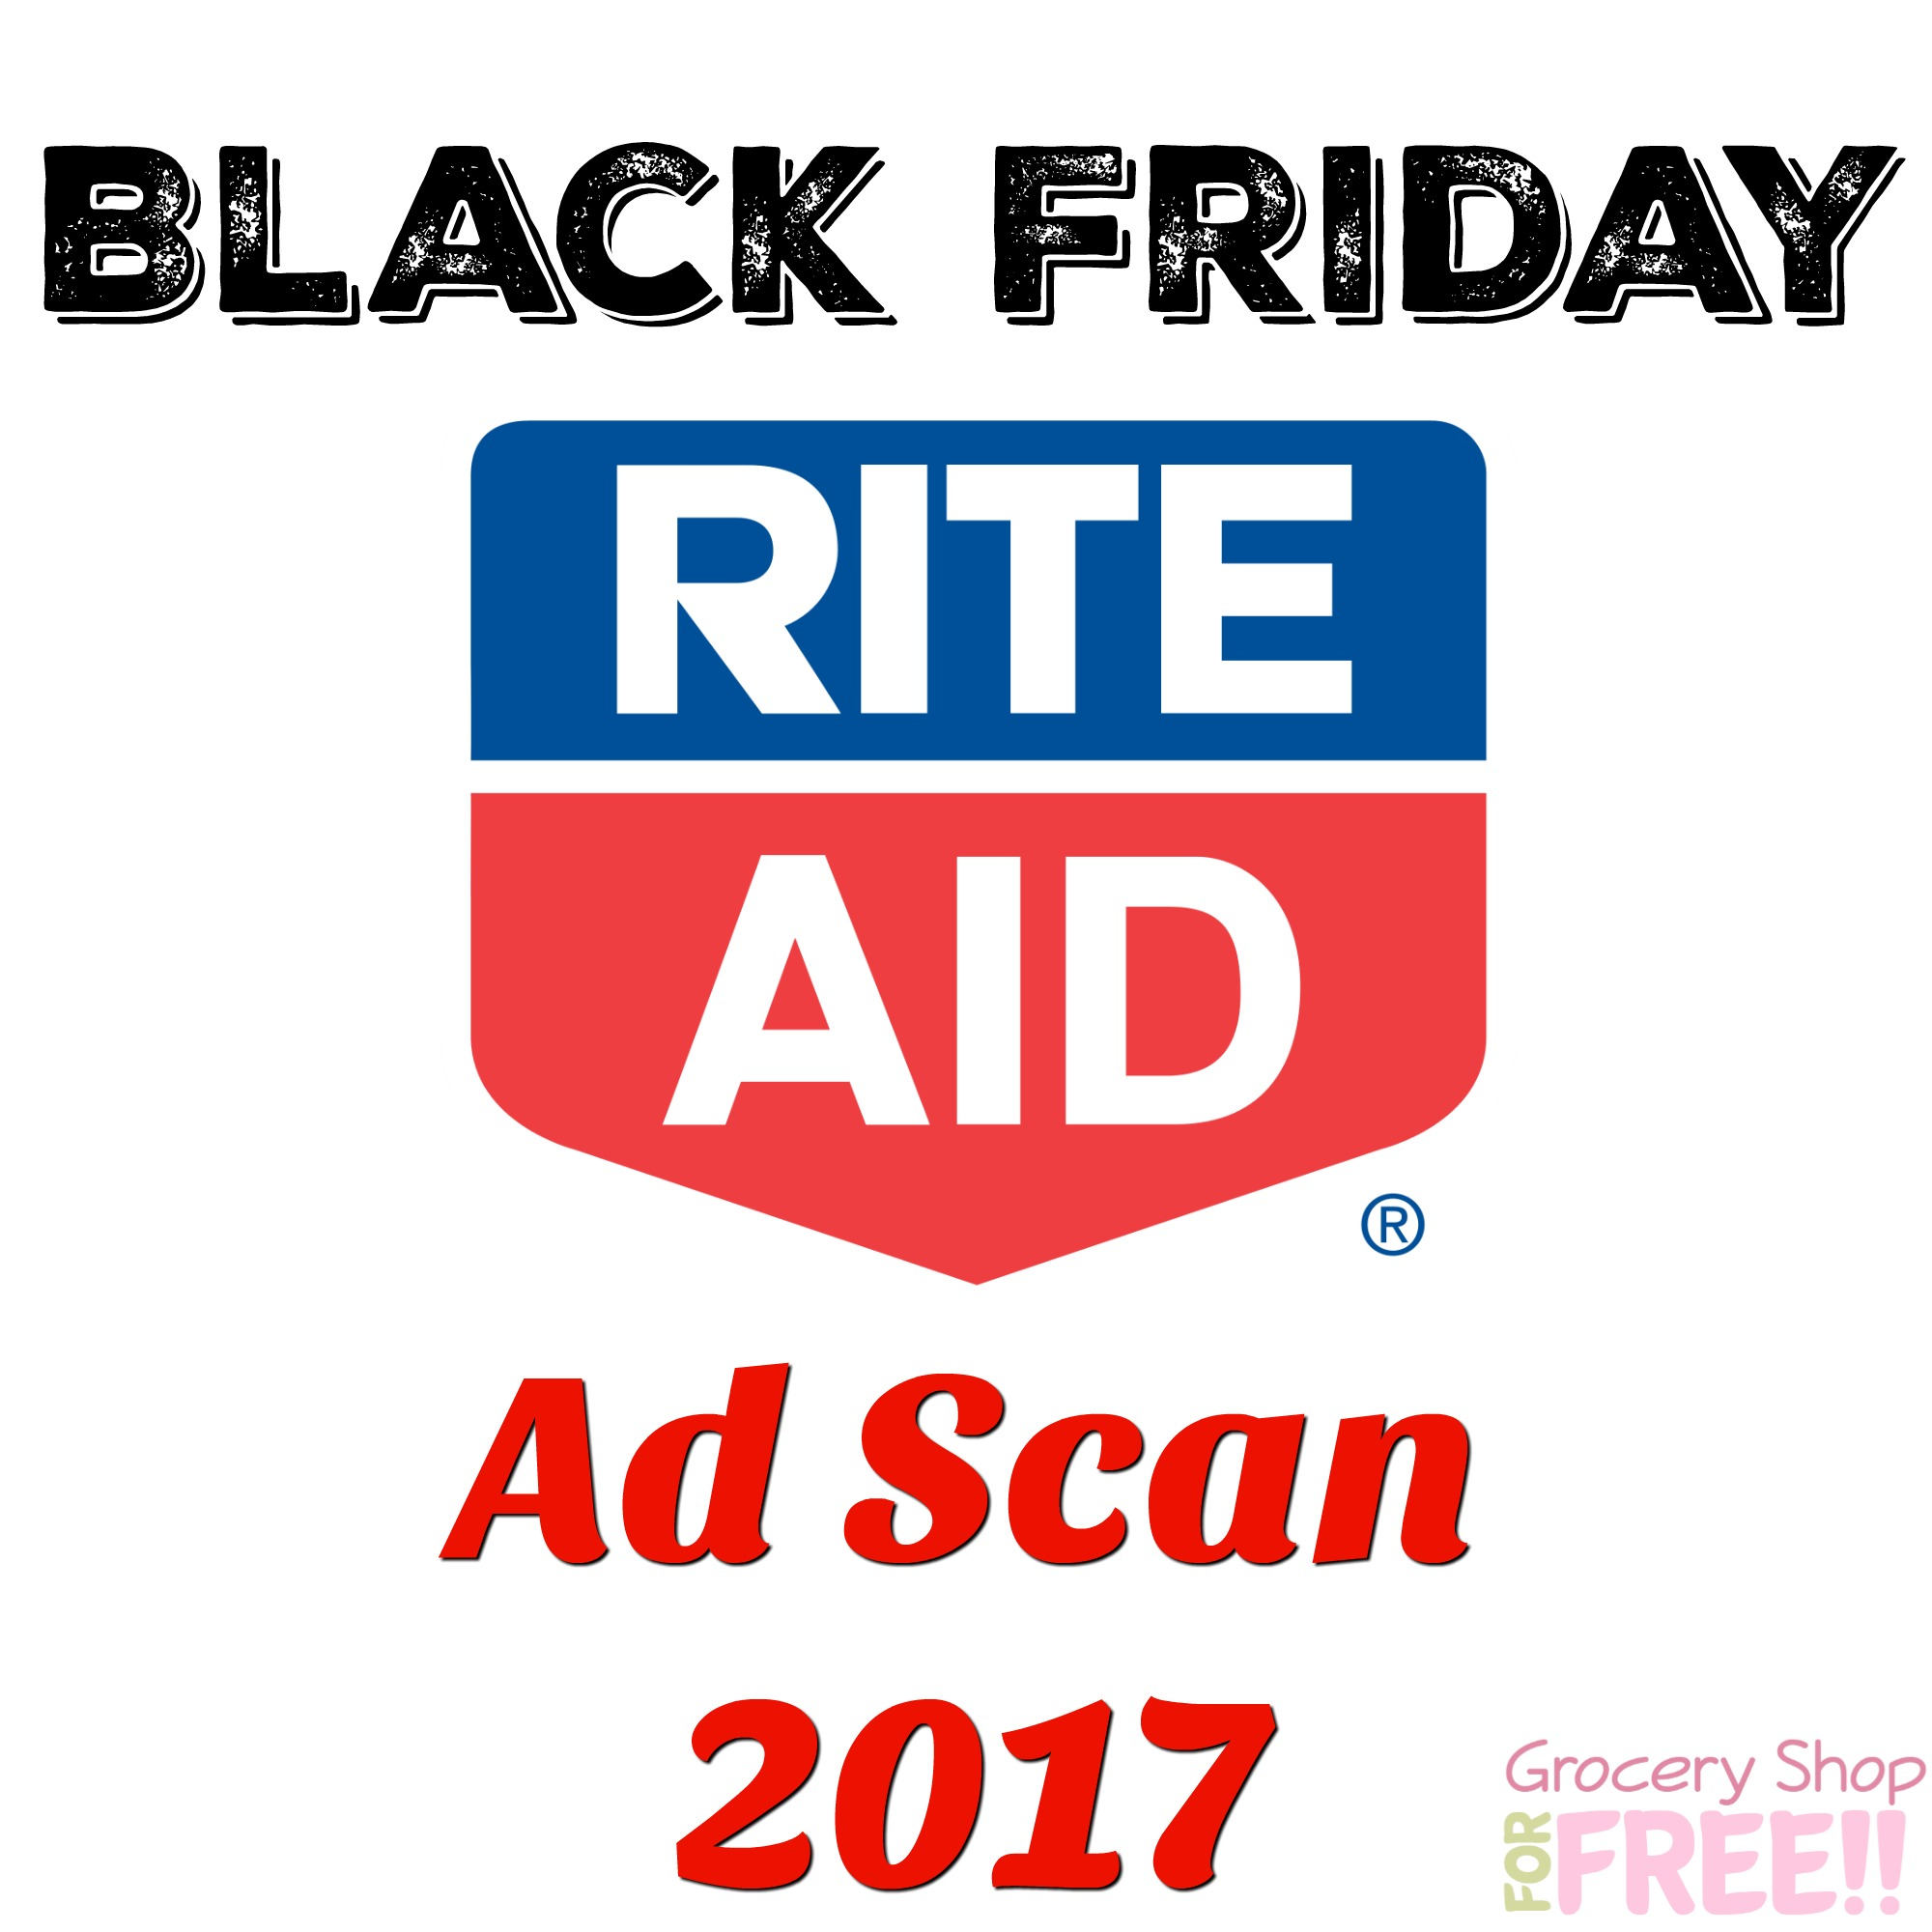 Rite Aid  2017 Black Friday Deals Ad Scan!